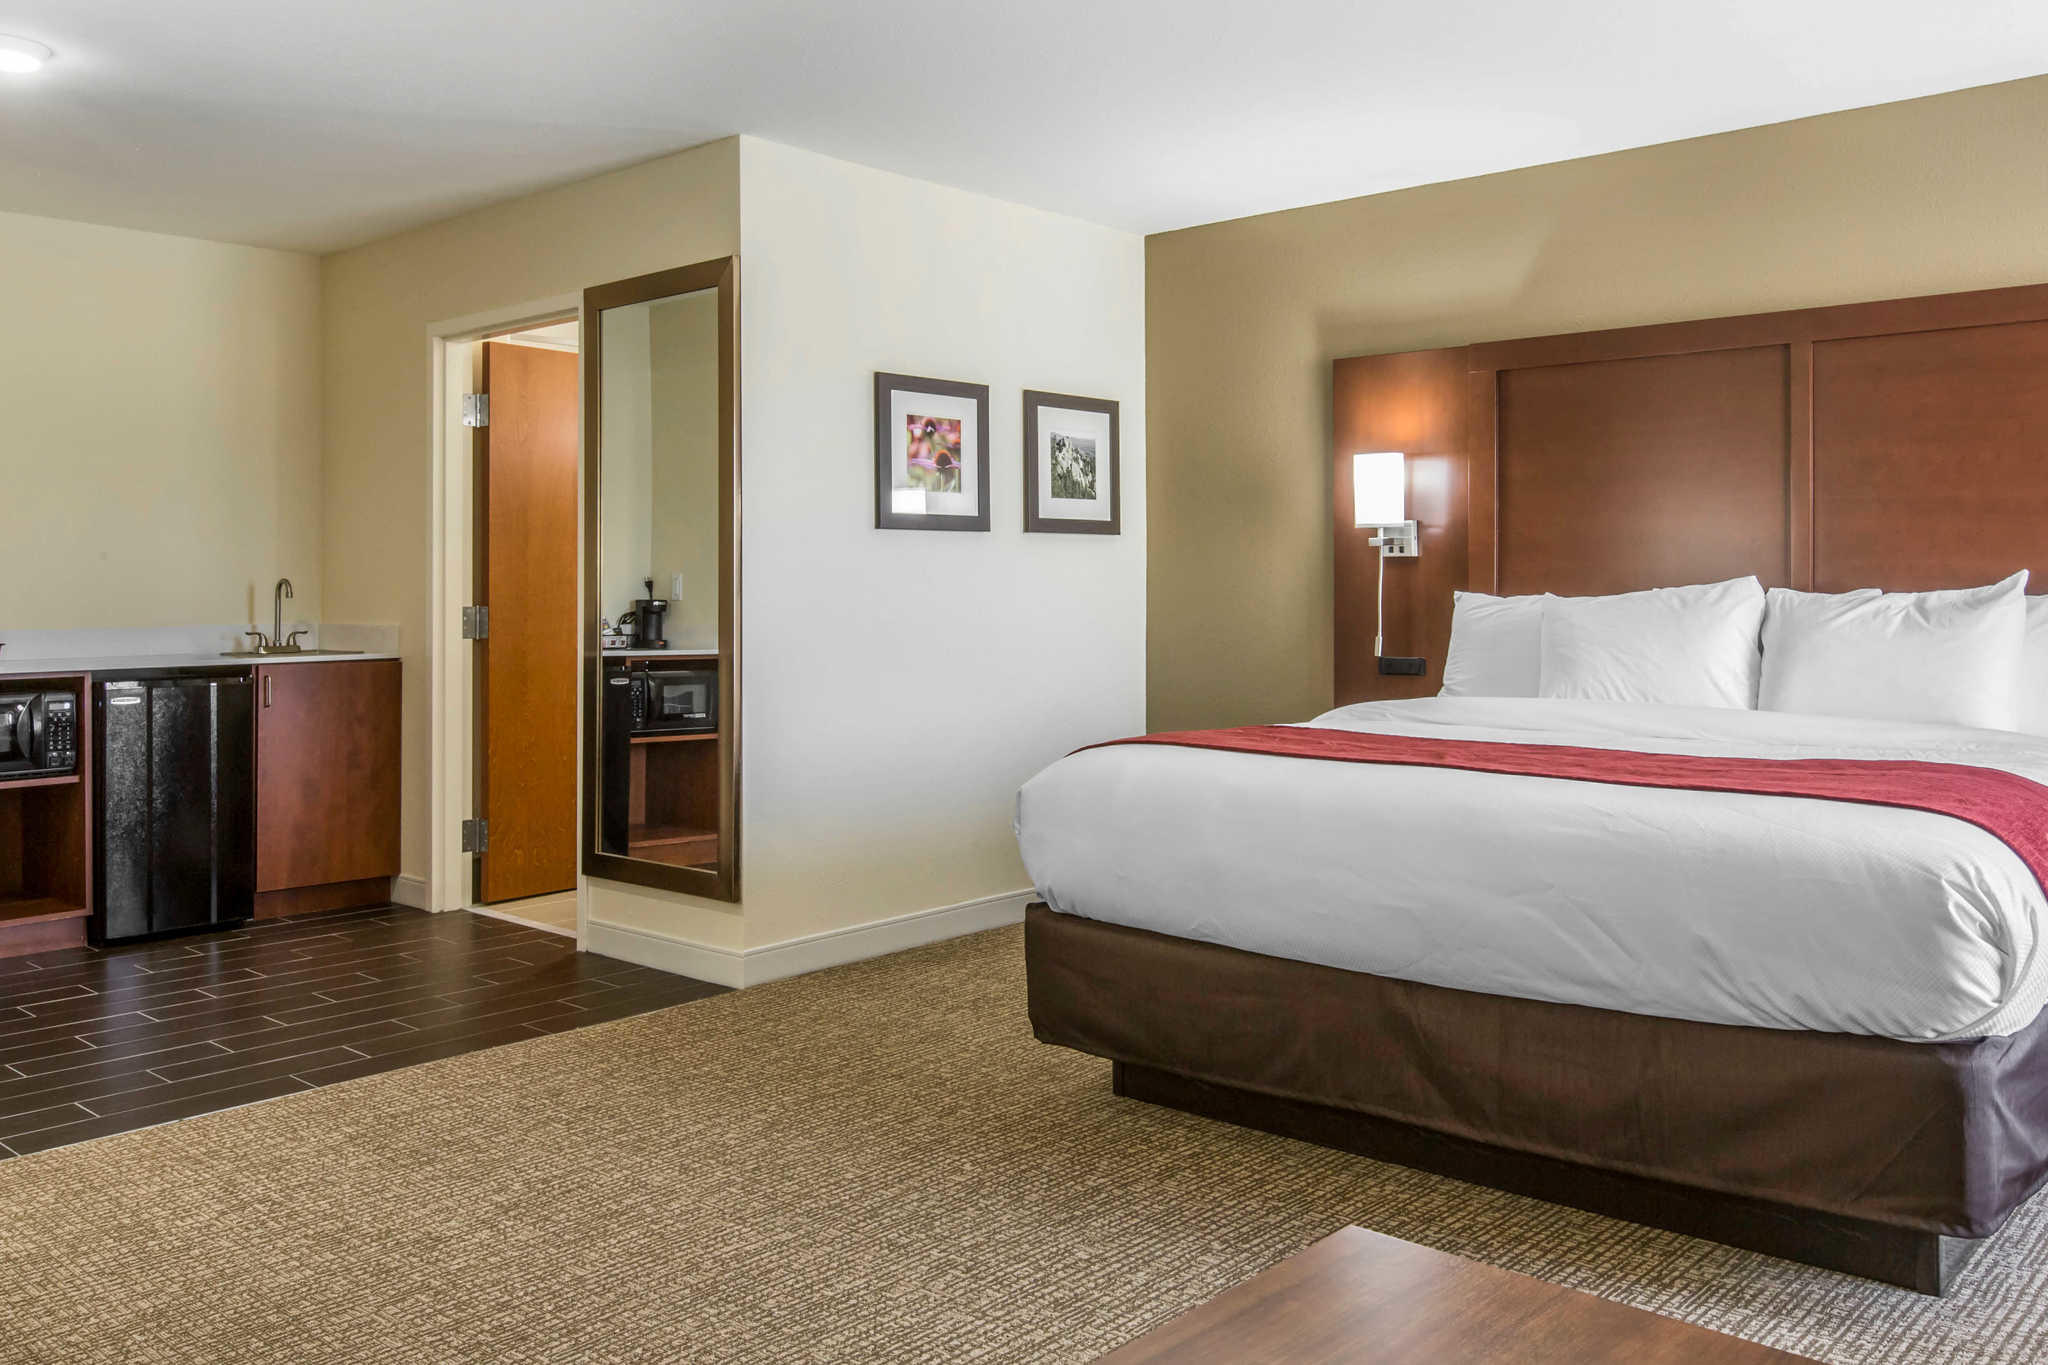 Comfort Inn & Suites West image 26